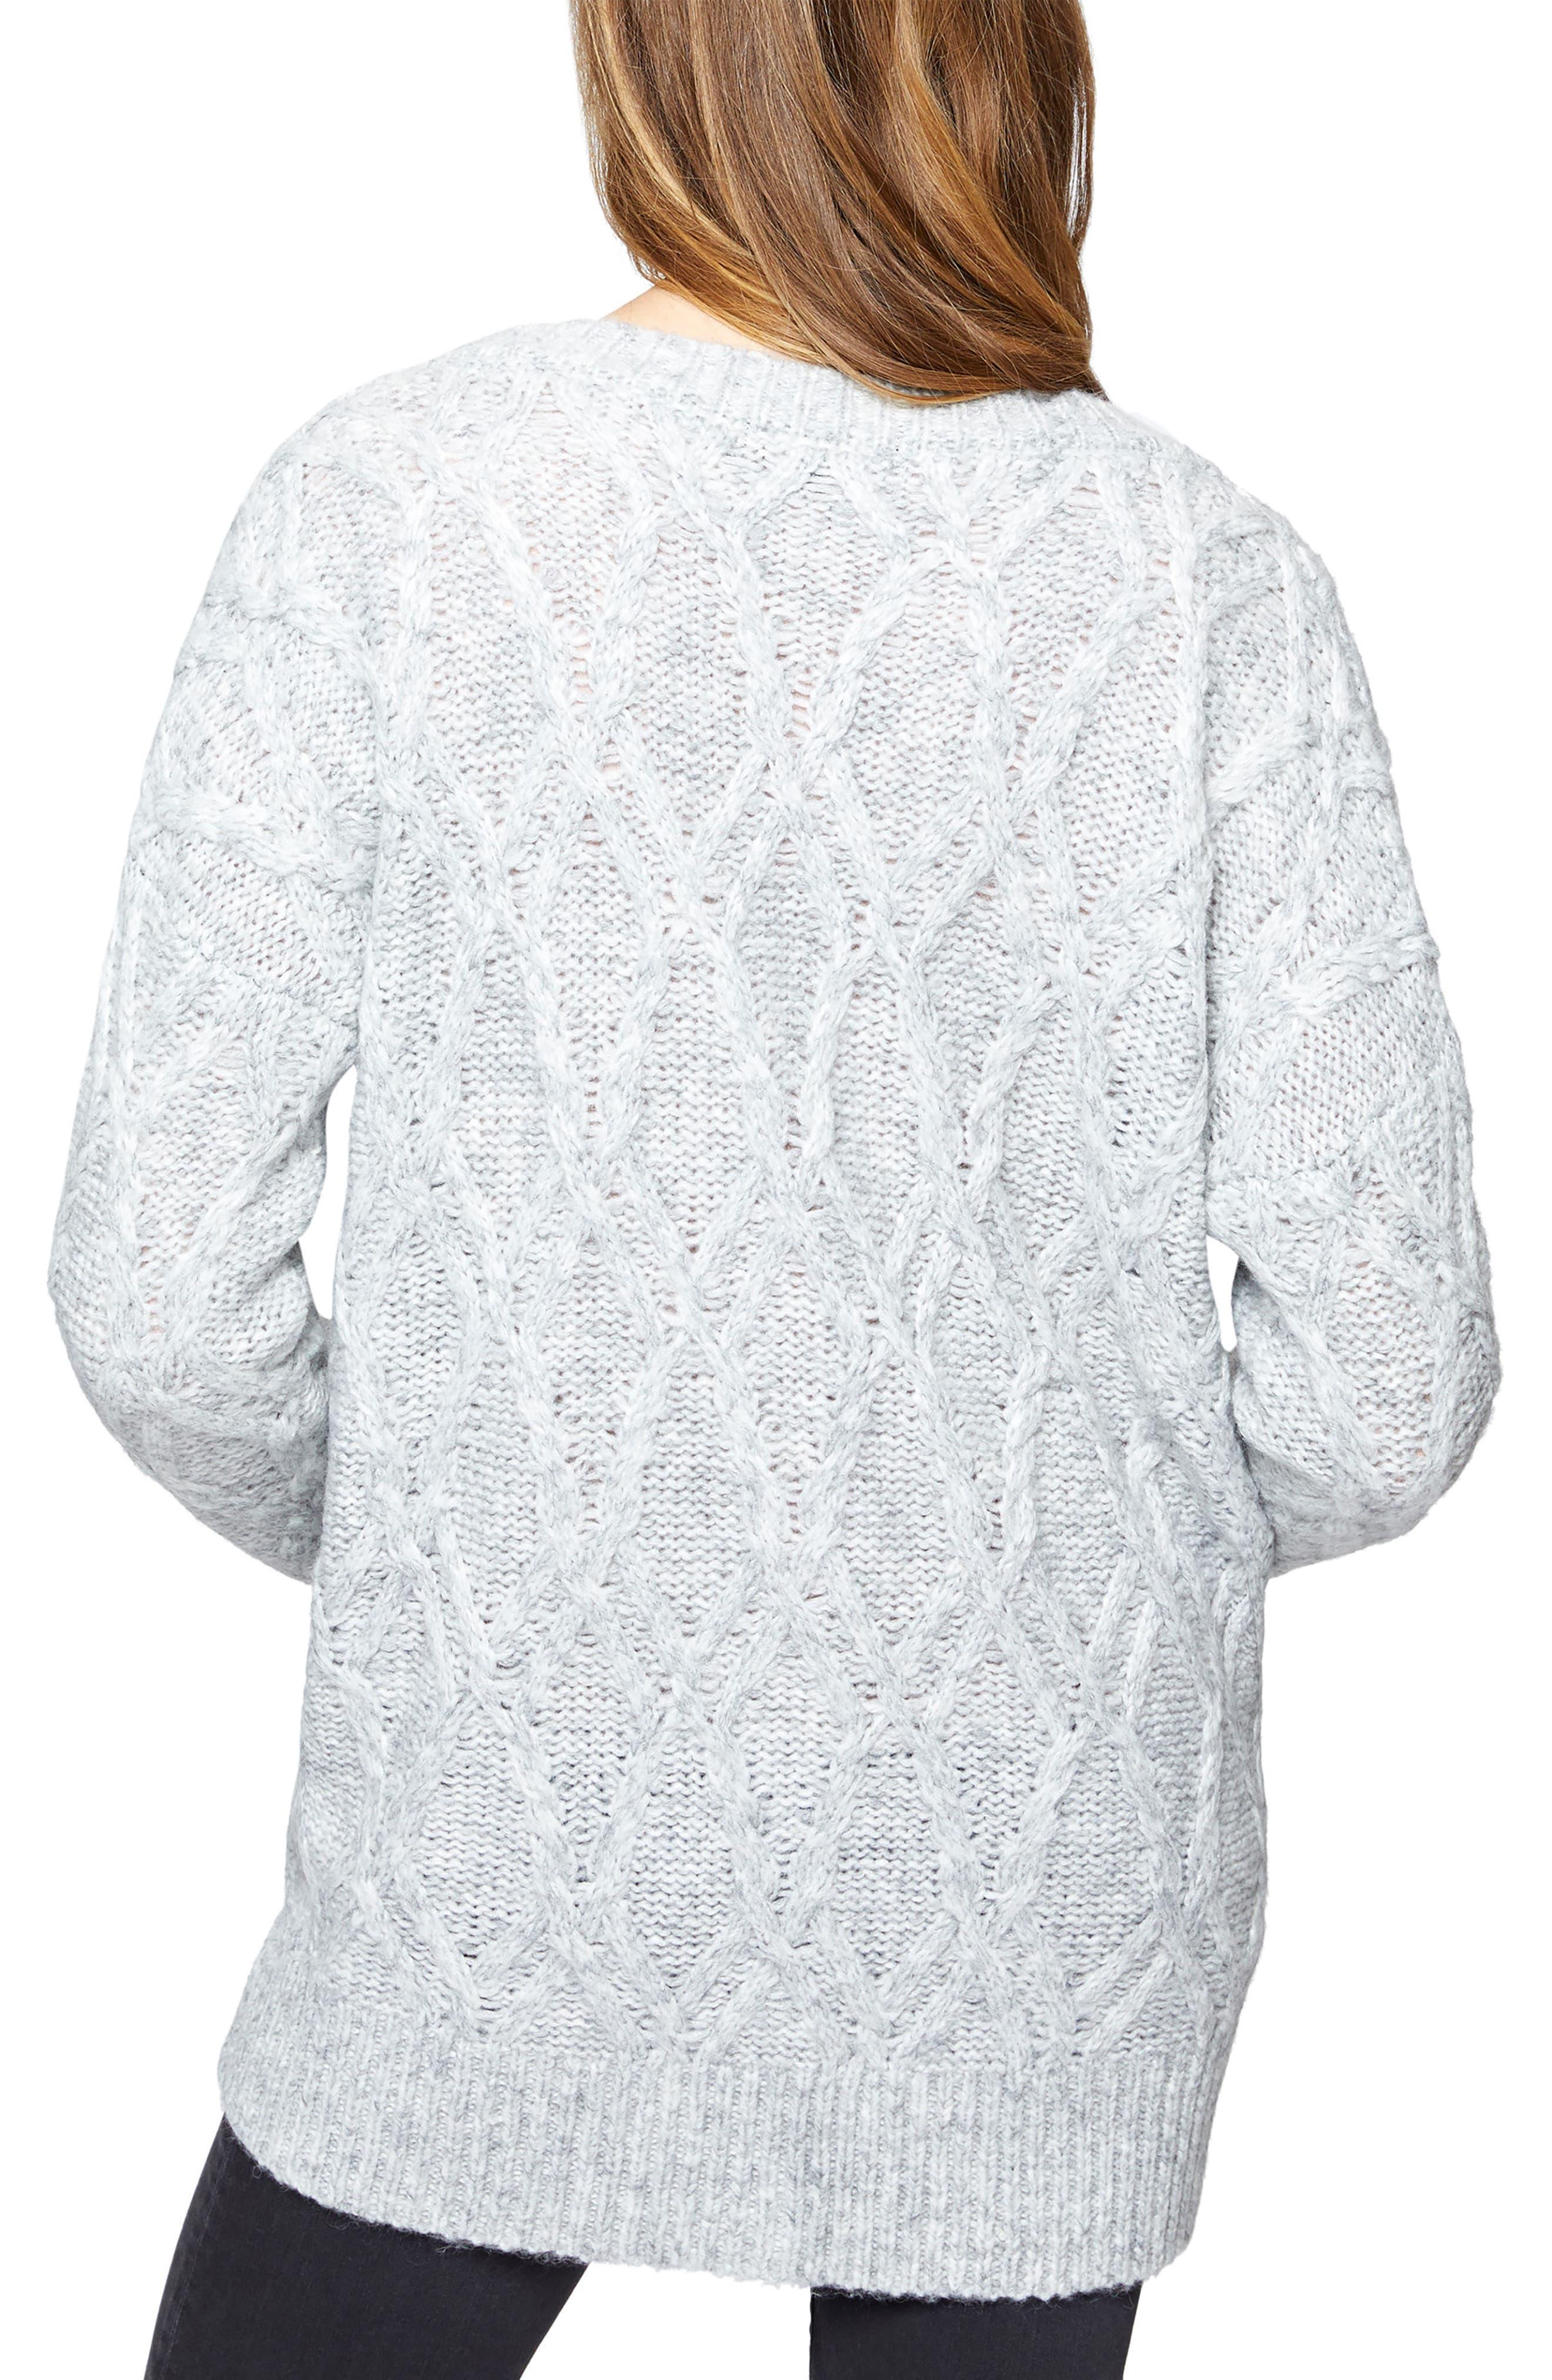 Urban Knit Cardigan,                             Alternate thumbnail 2, color,                             050